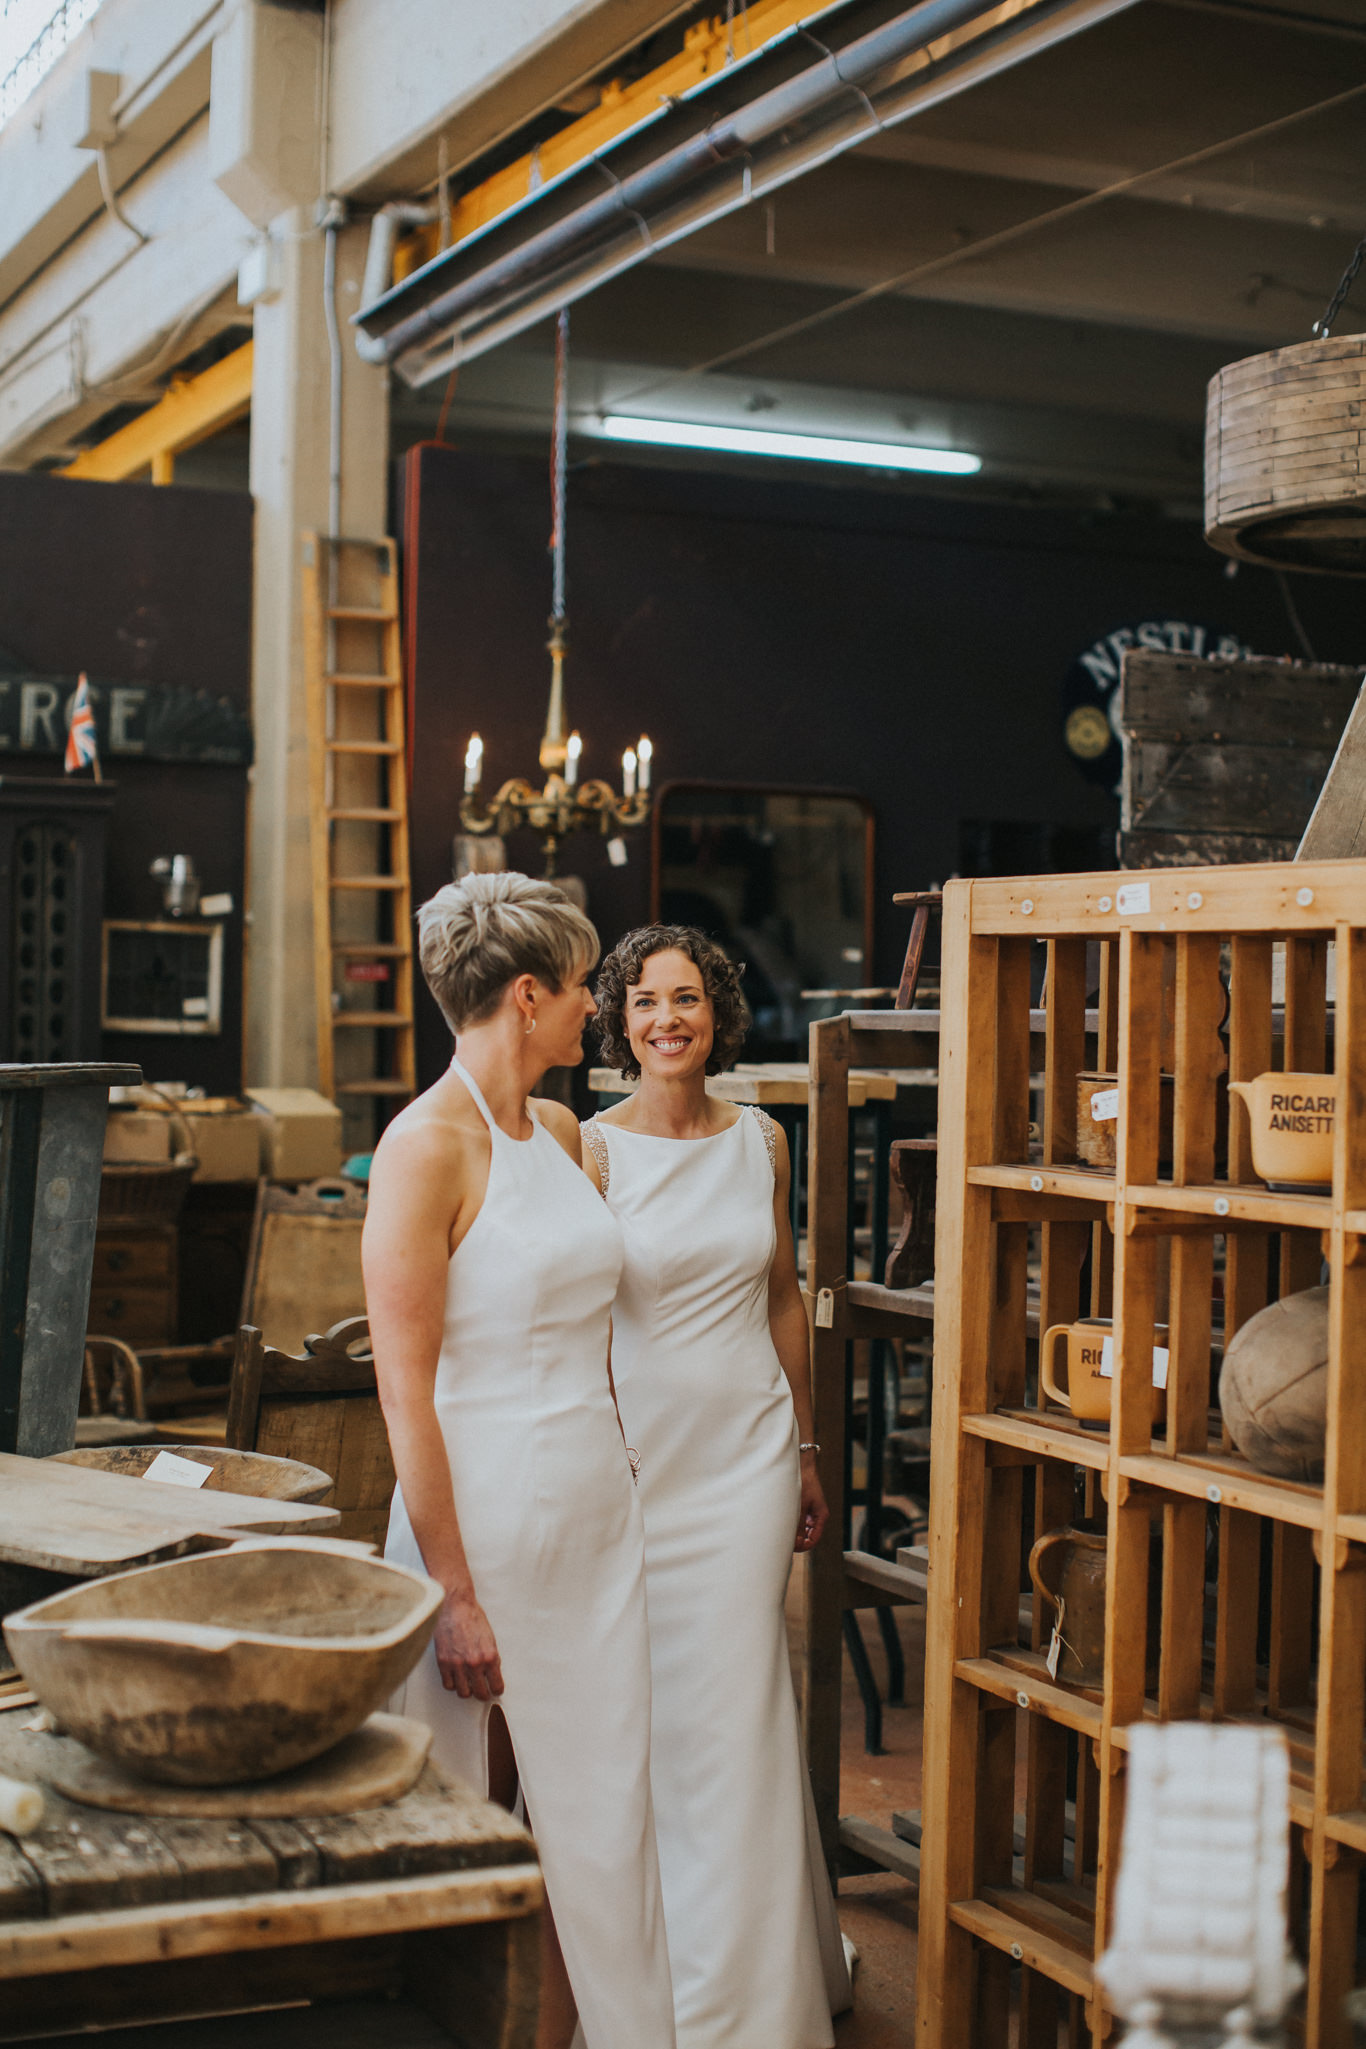 Lindsay-and-Heather-Charbar-Restaurant-Wedding-in-Calgary-35